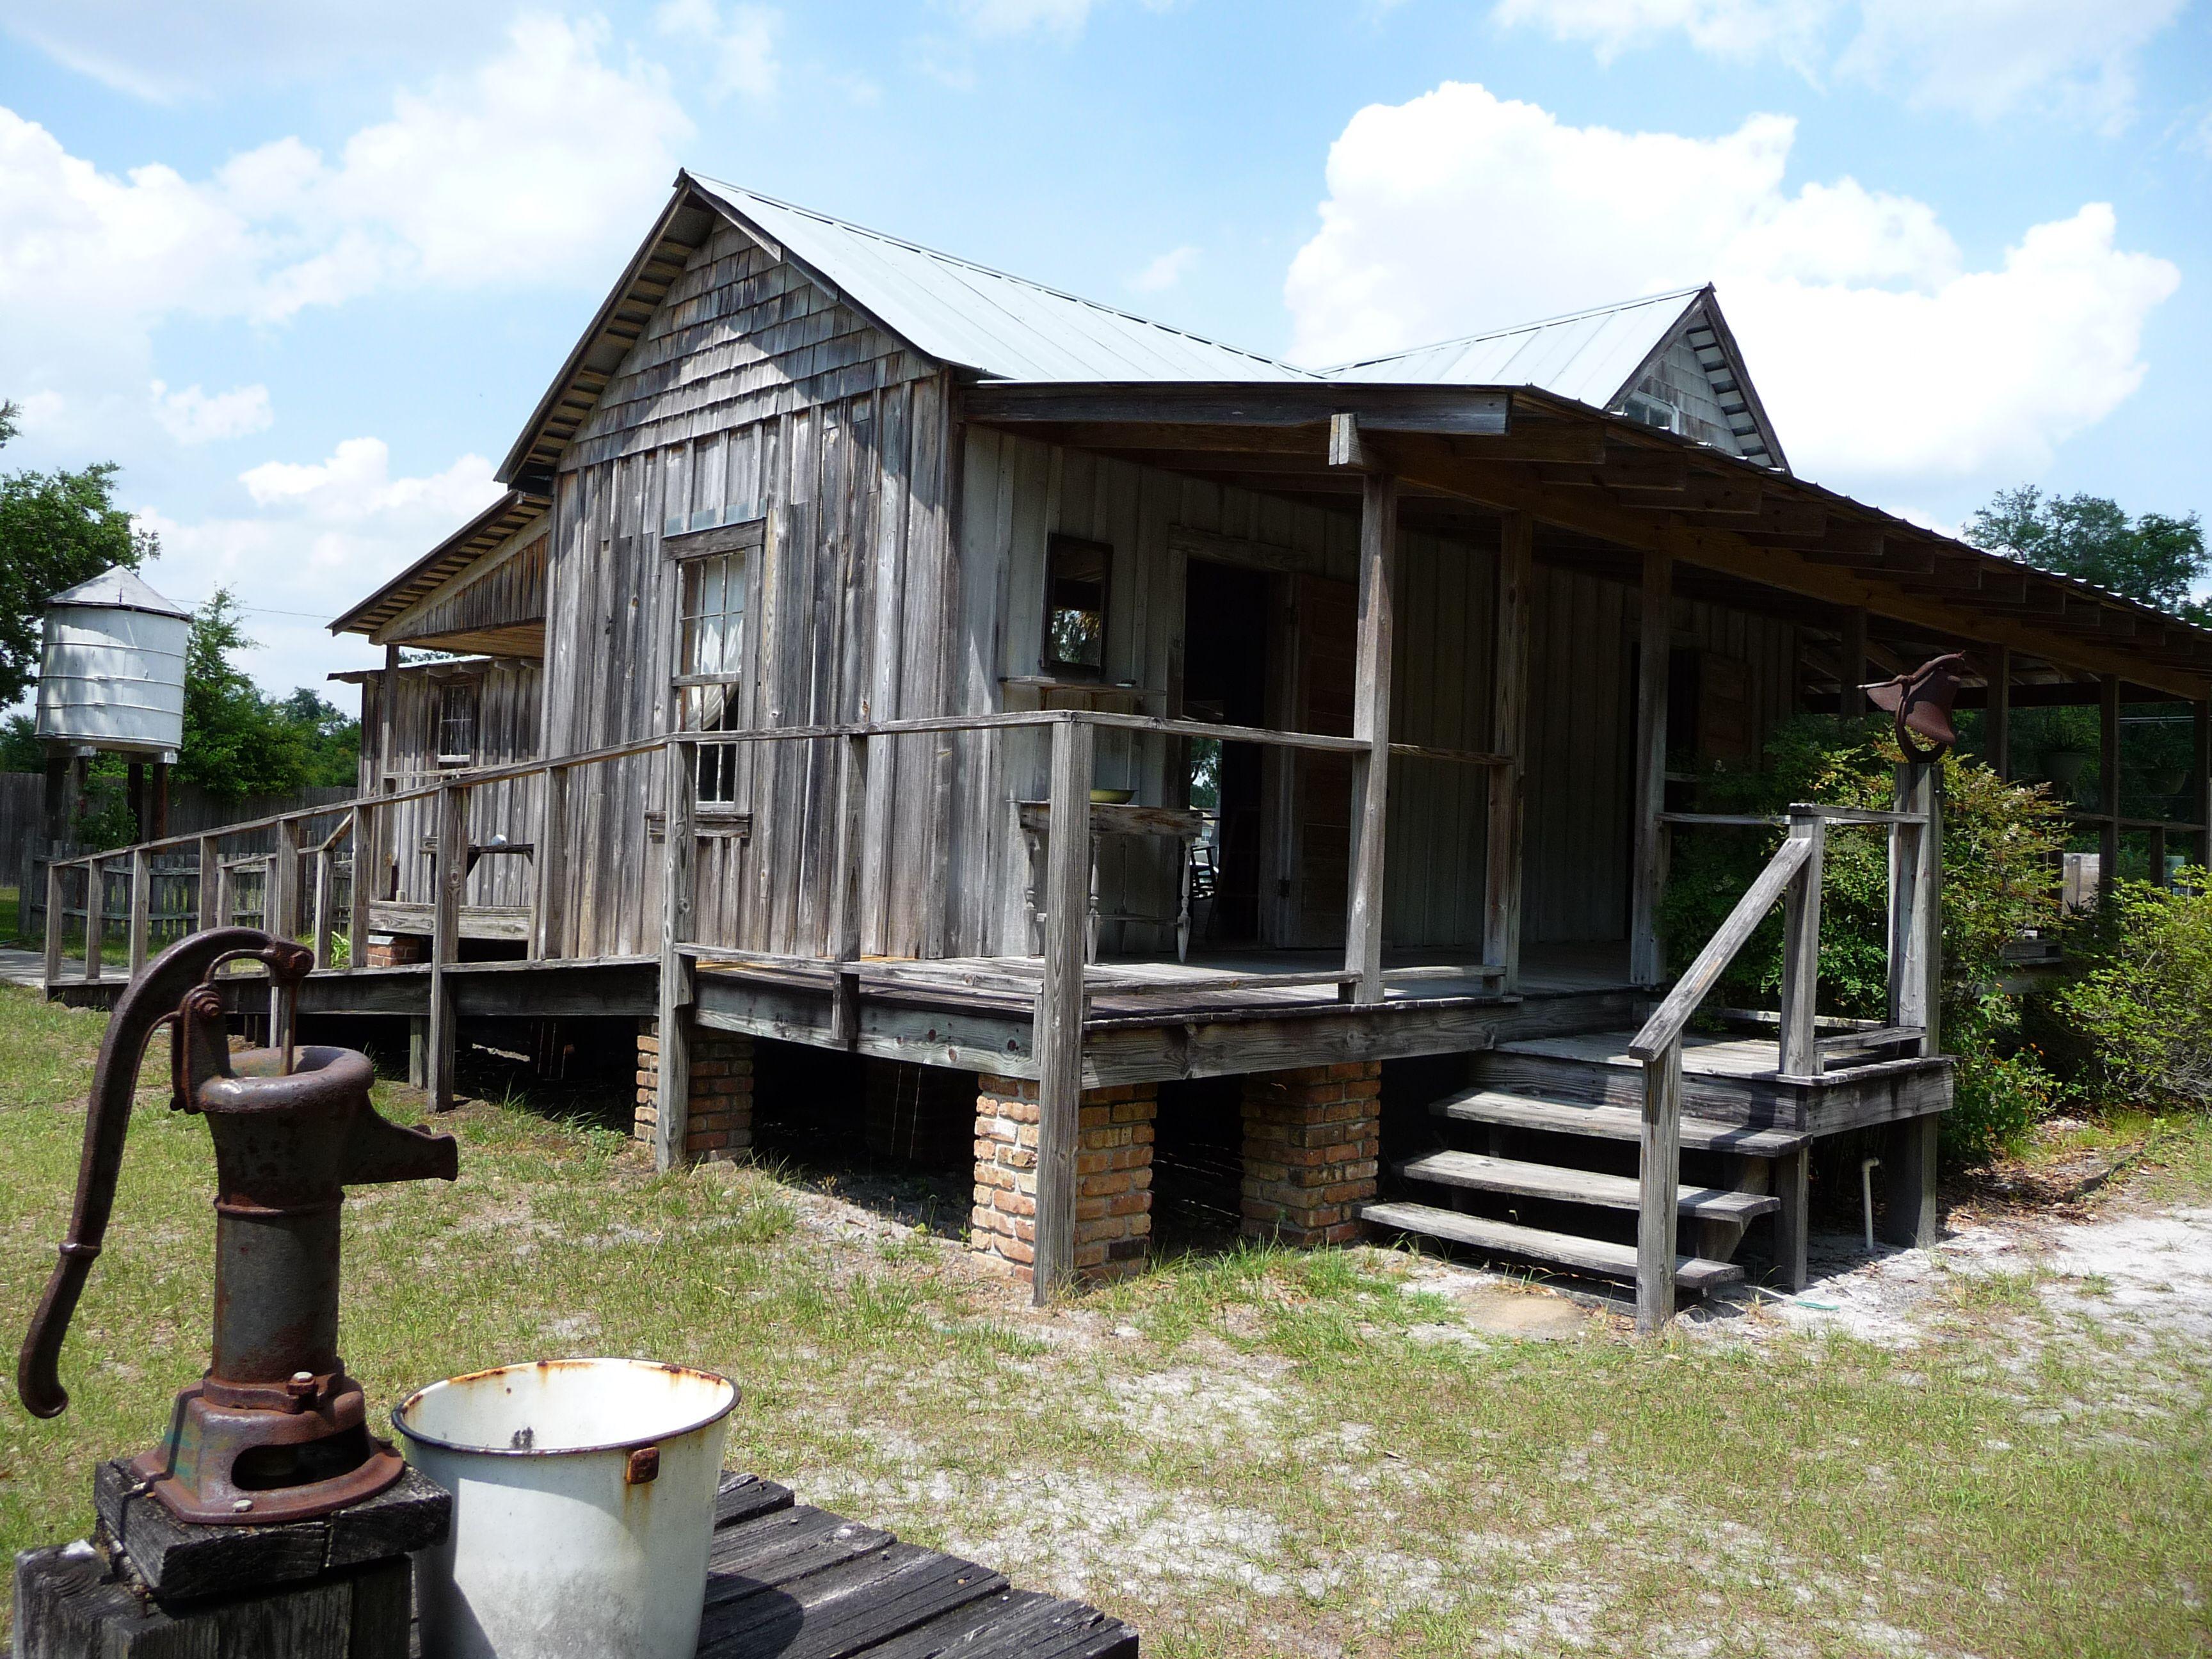 48 Kissimmee Cabin Rentals Orbitz